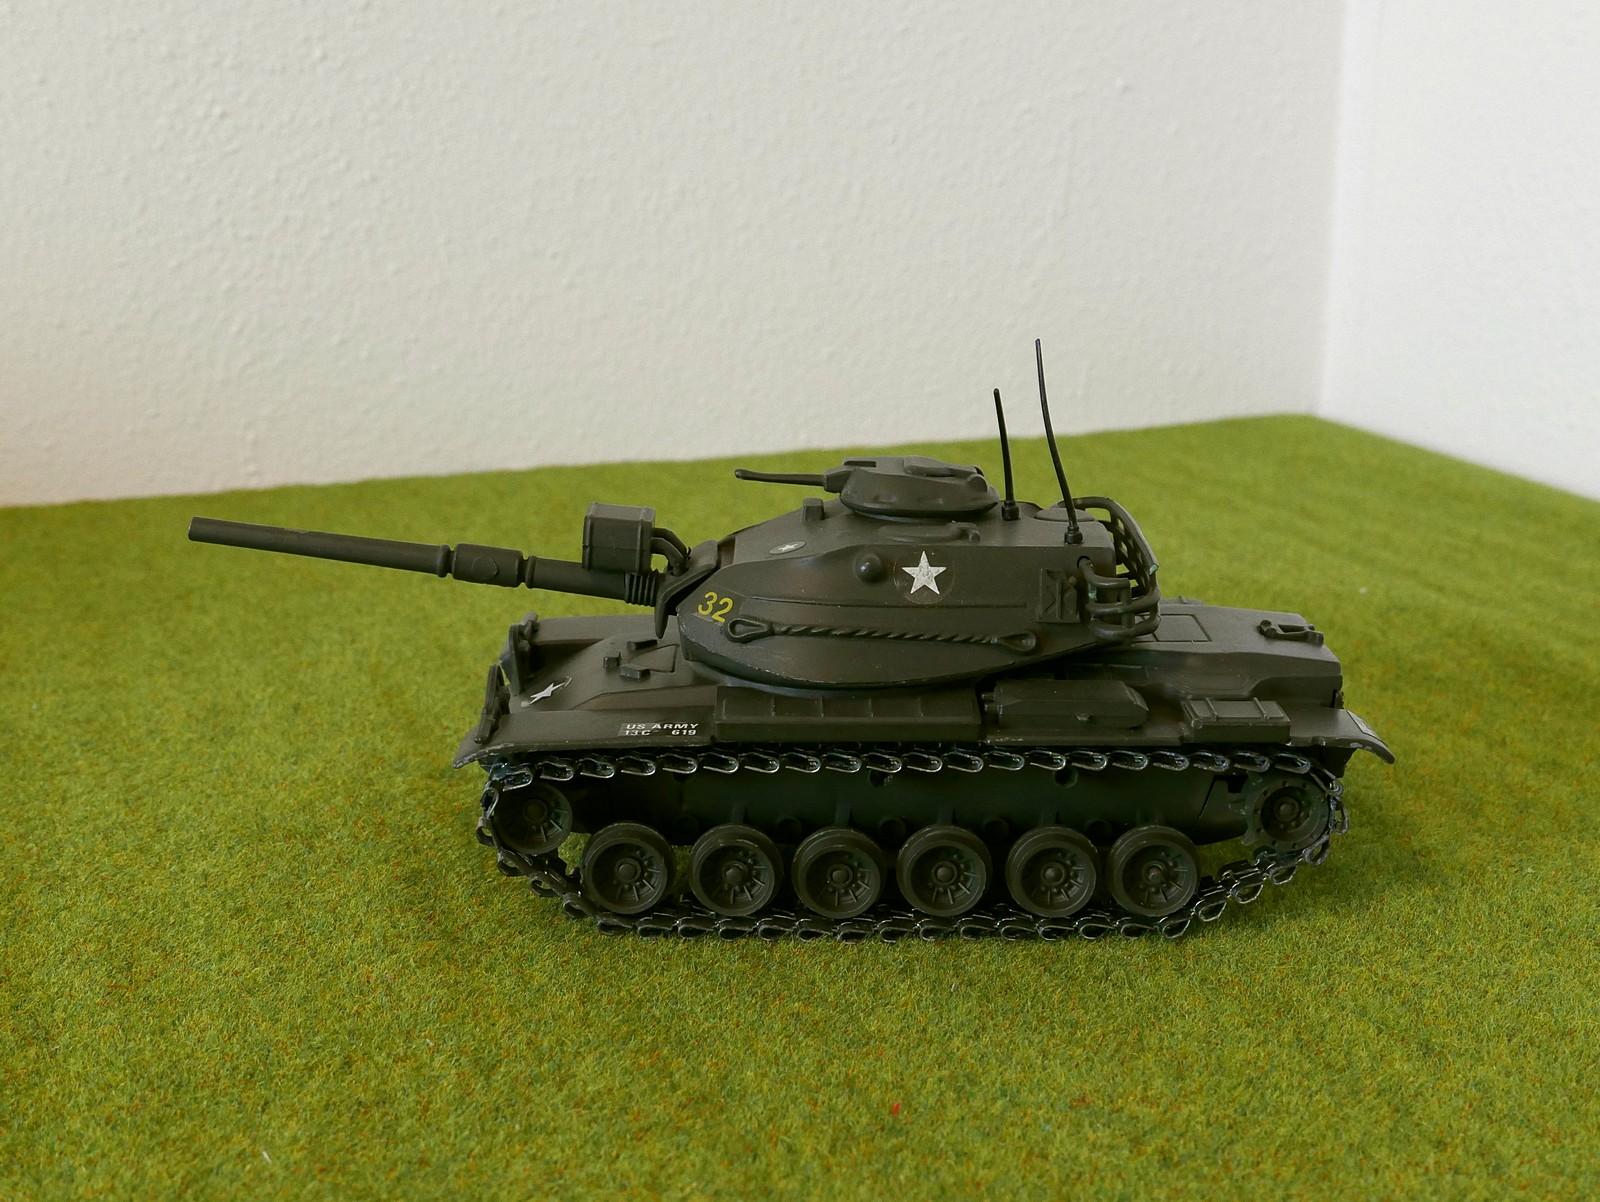 Polistil 1 50 Scale Diecast Tank Collection